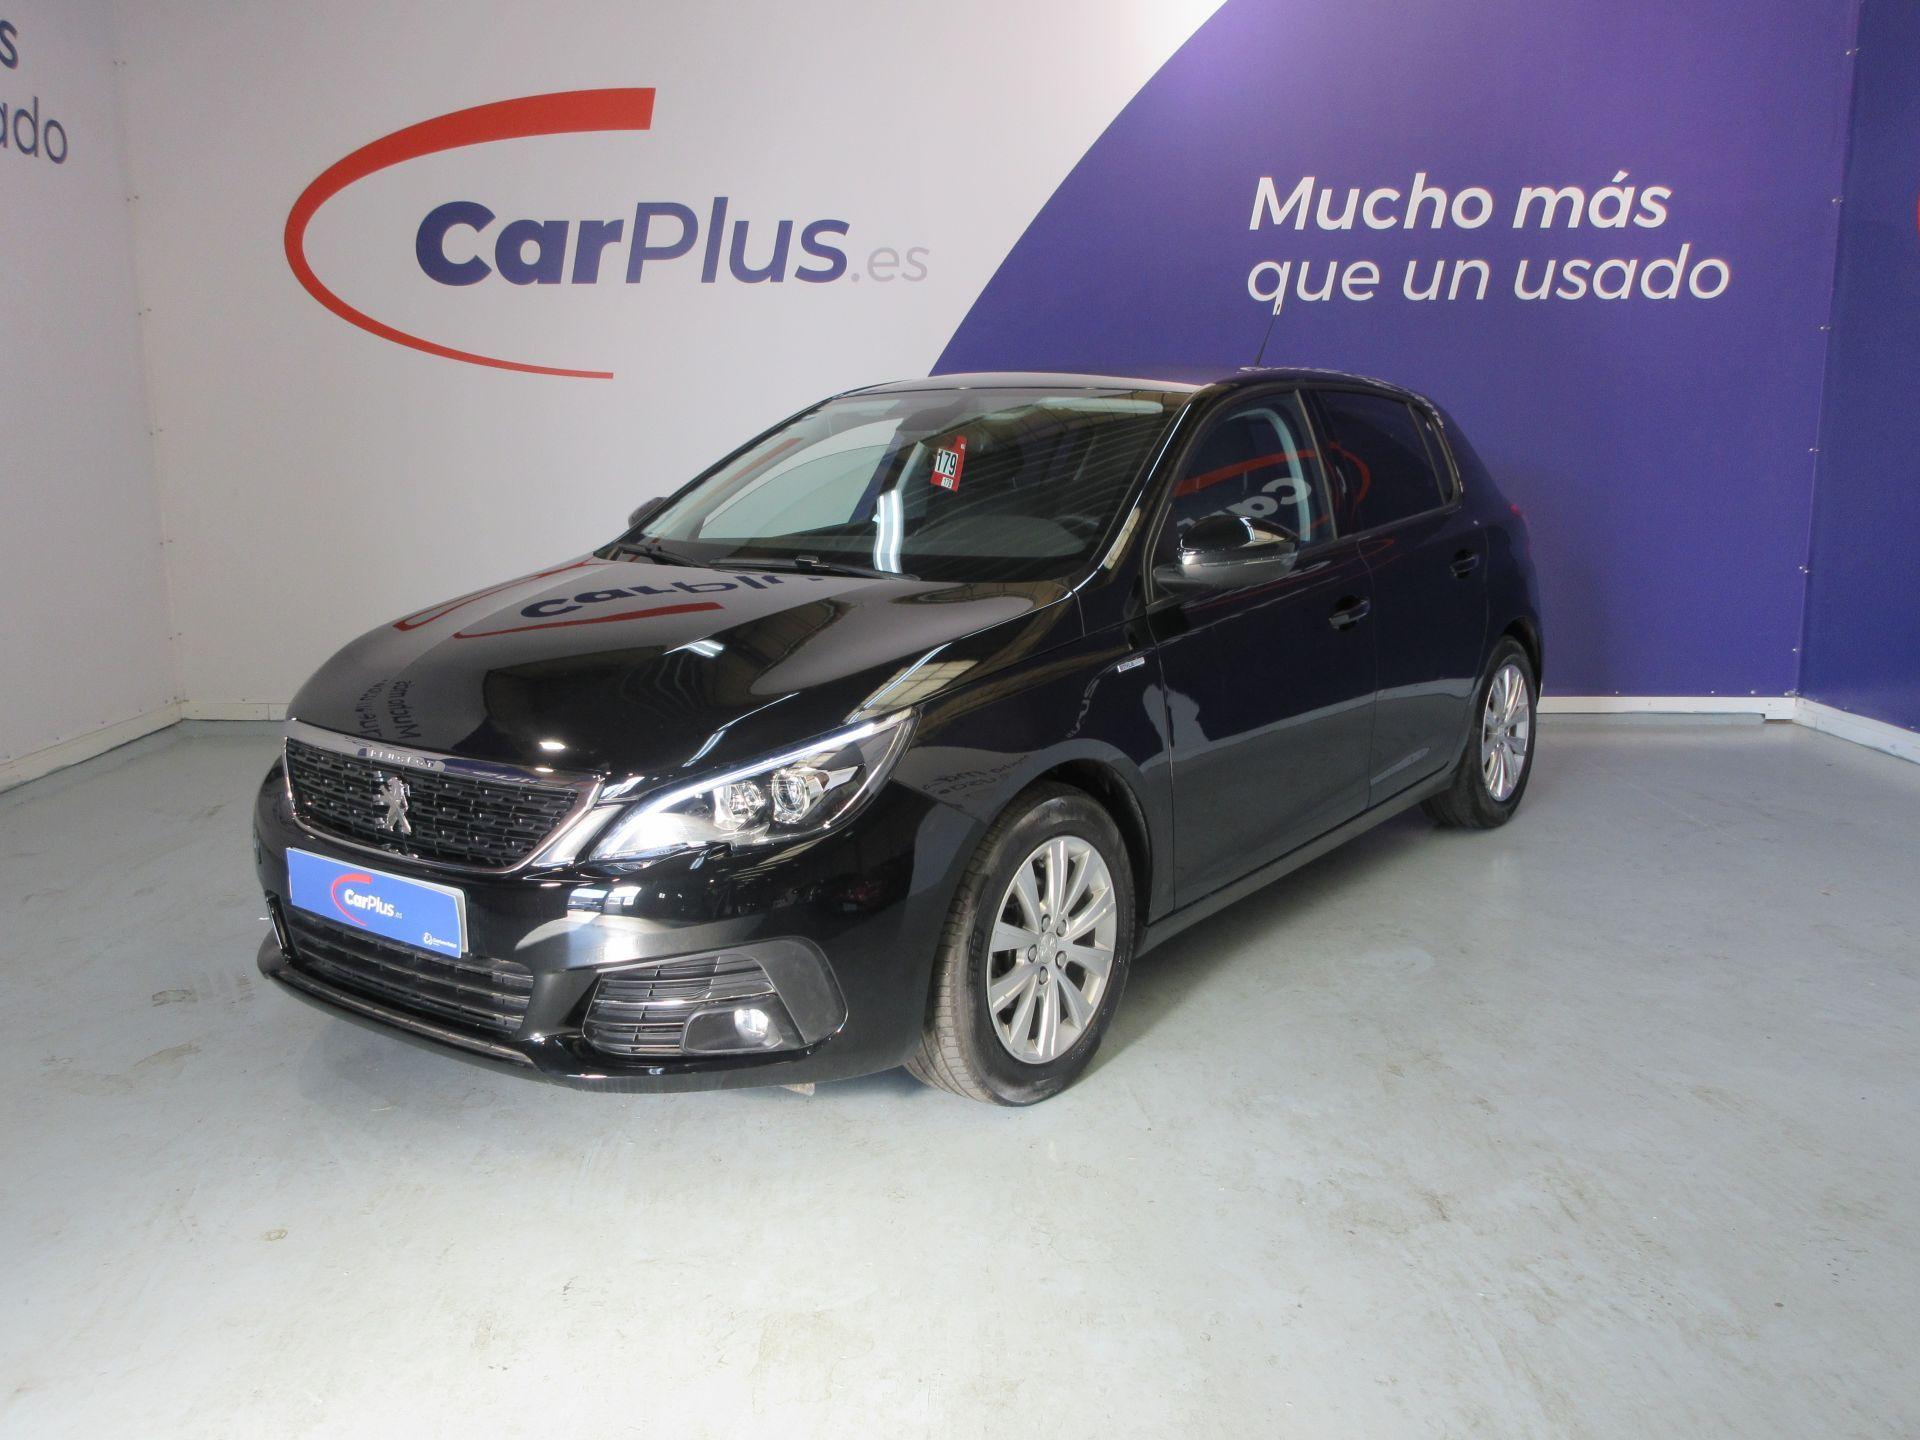 Peugeot 308 ocasión segunda mano 2020 Diésel por 17.790€ en Madrid